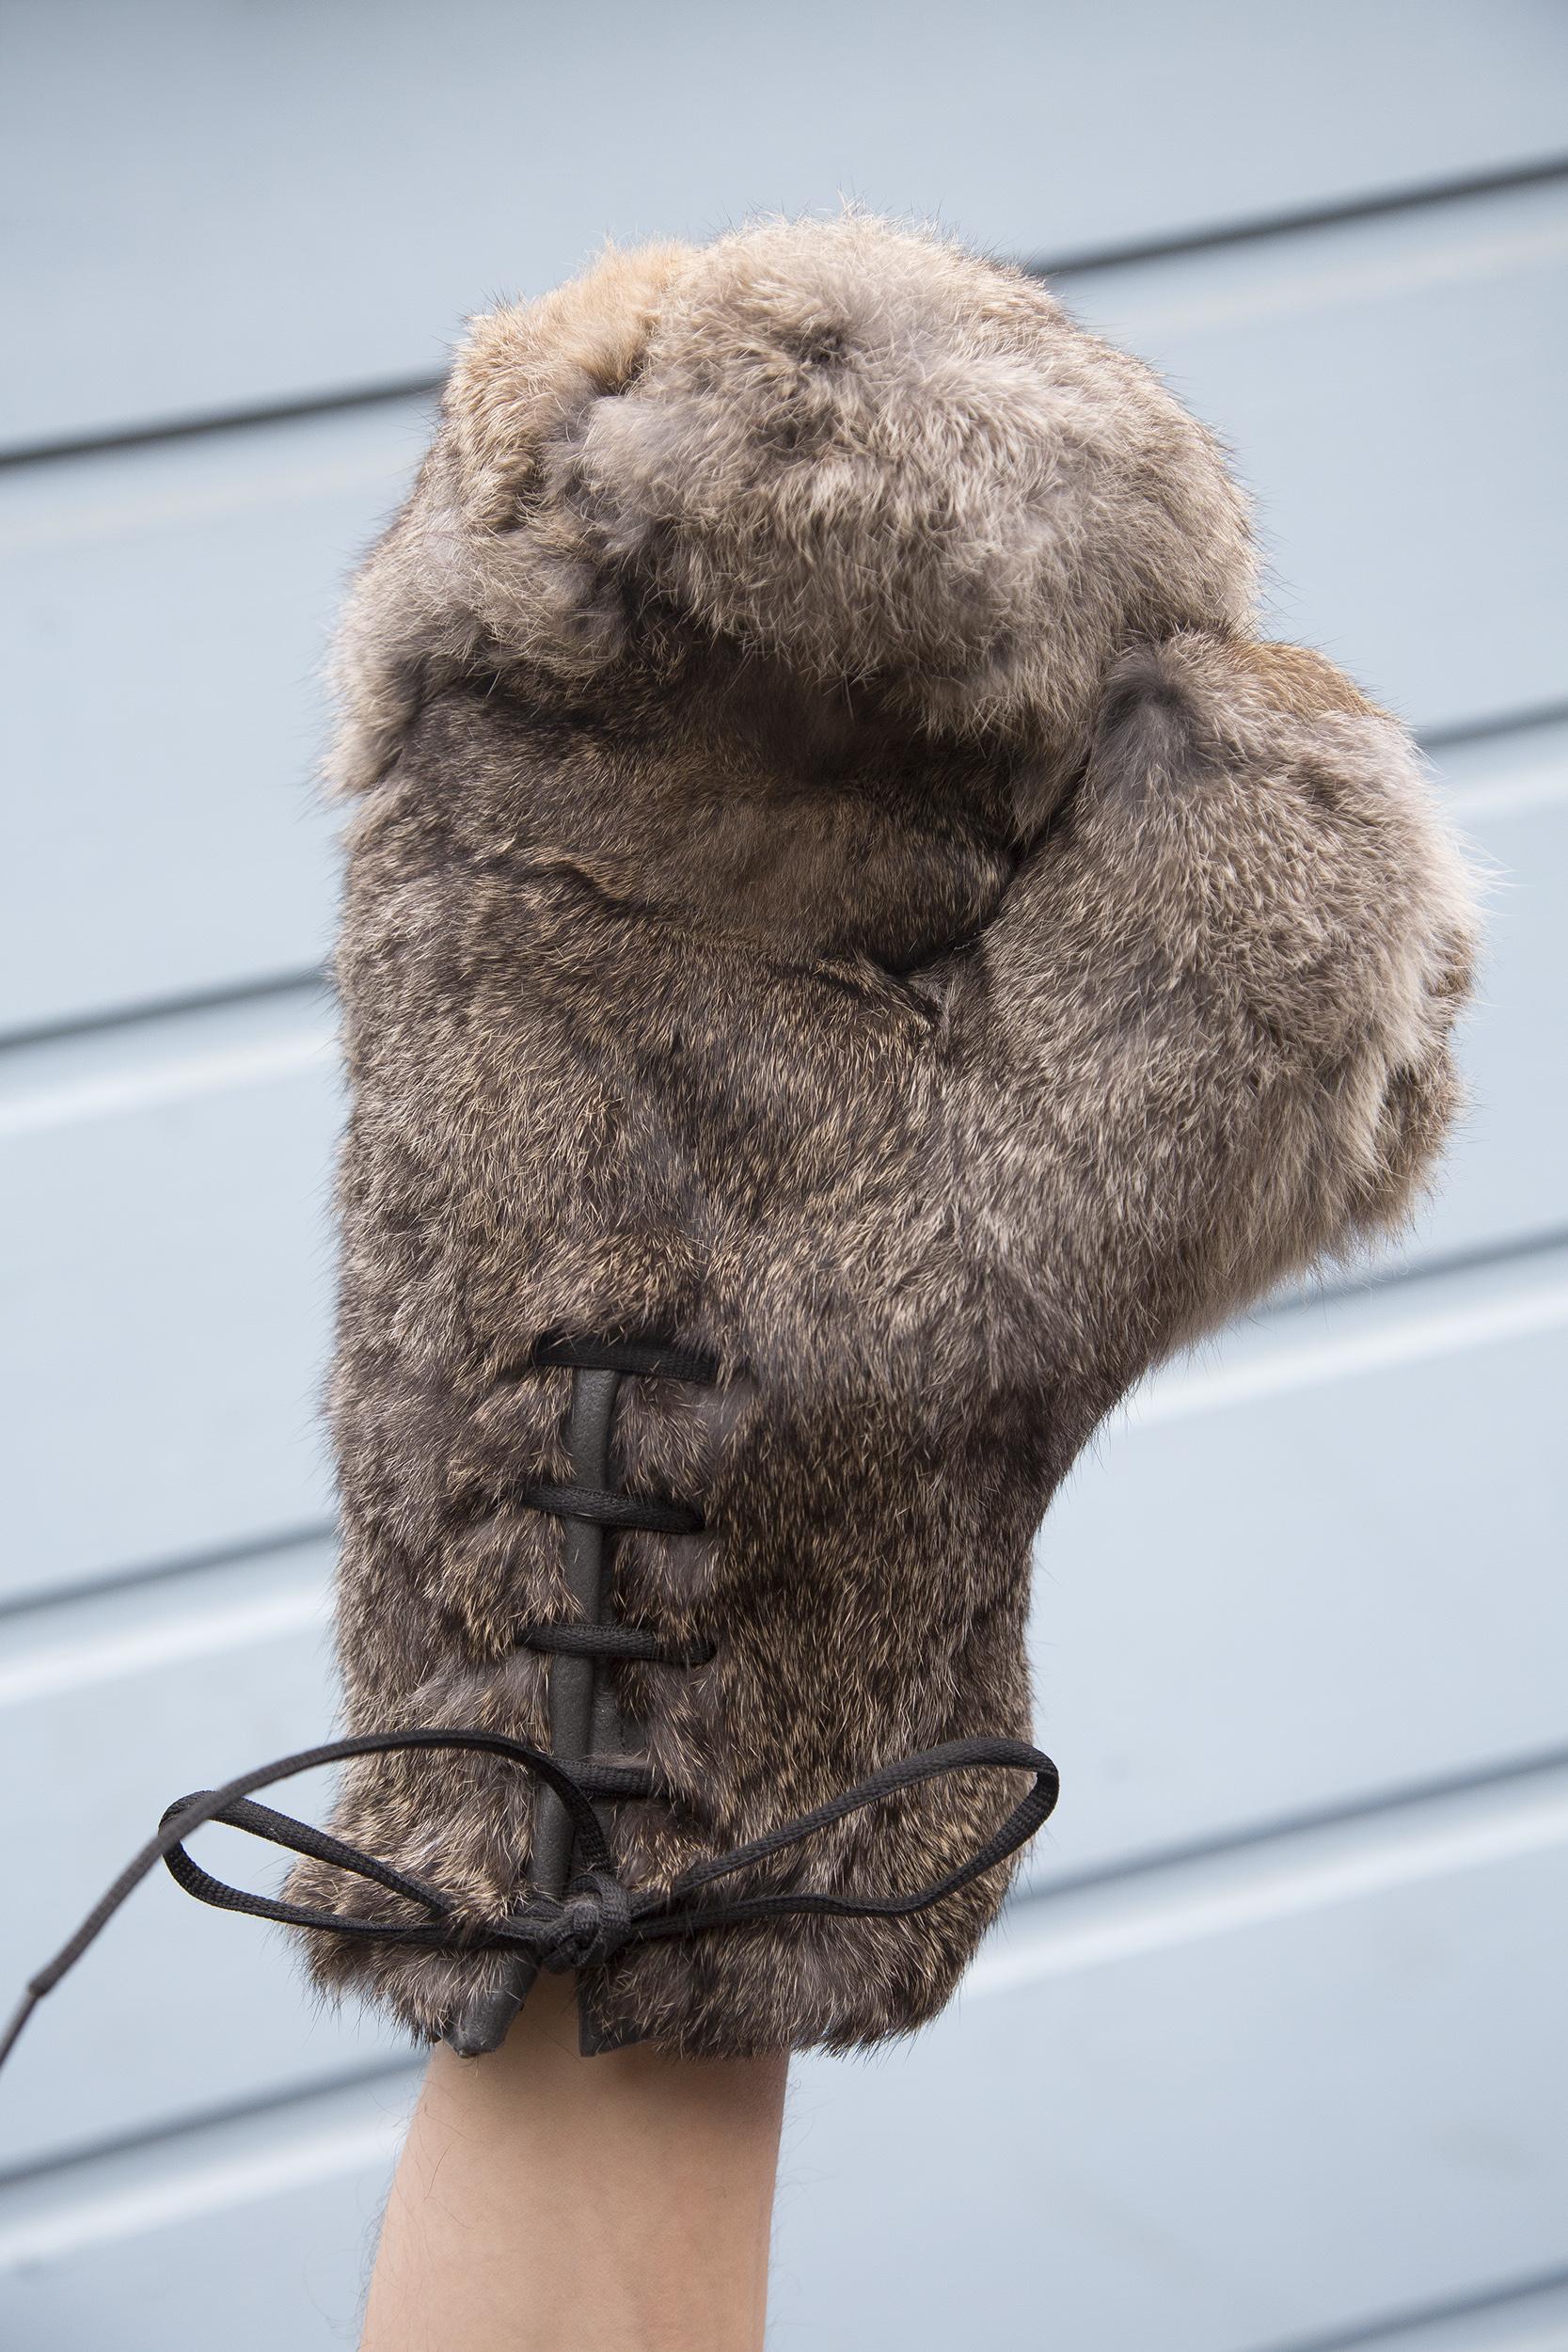 Boxing Gloves #3 (detail shot)